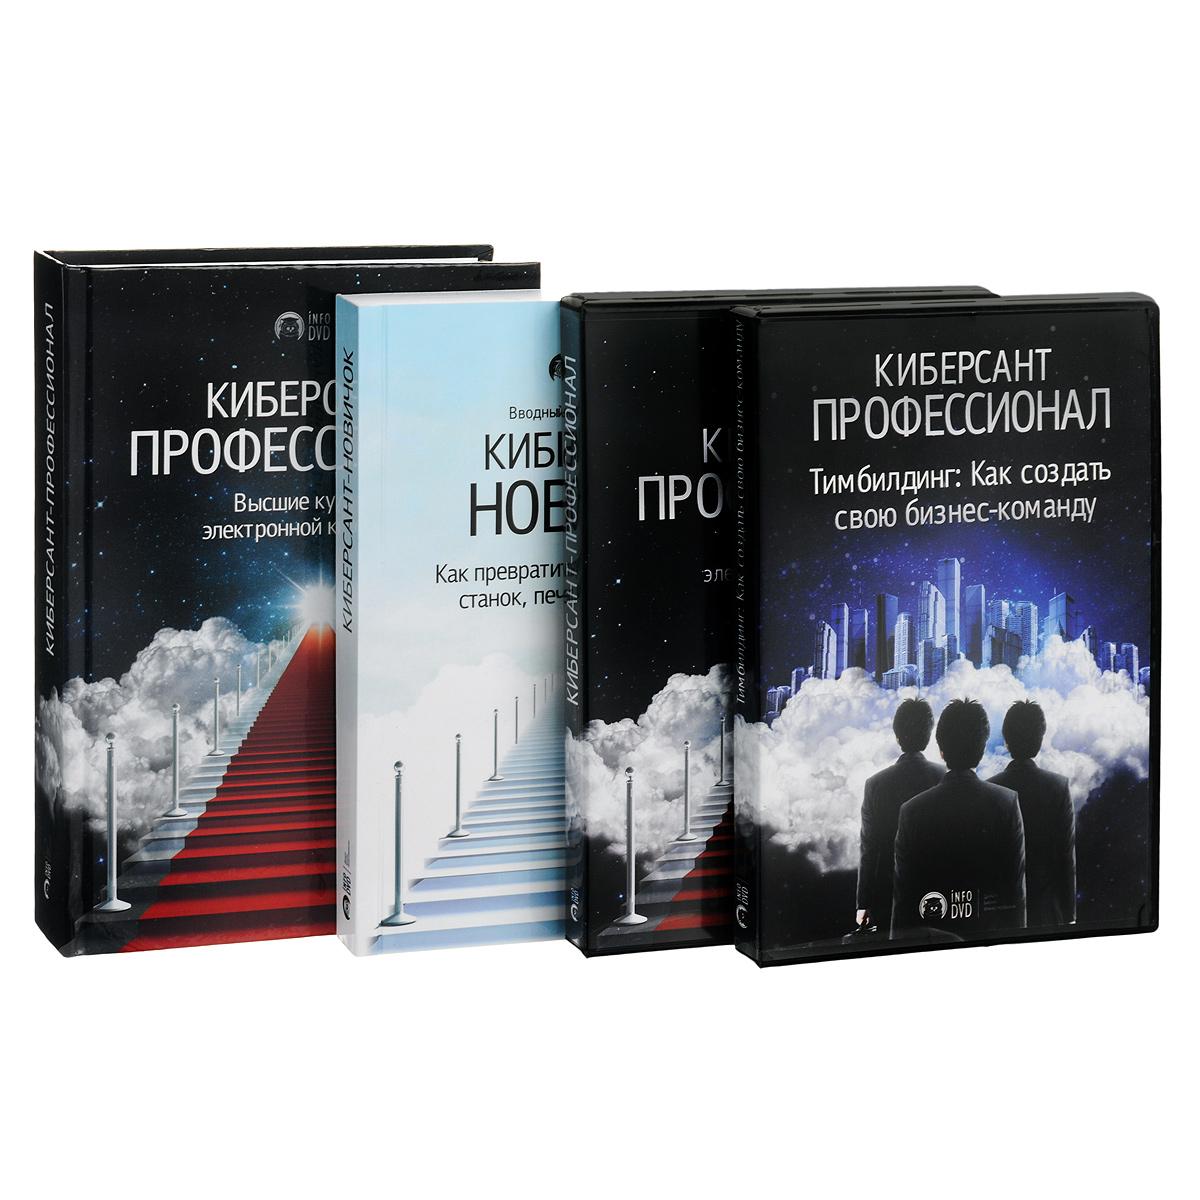 Киберсант-Профессионал (3 DVD + комплект из 2 книг)